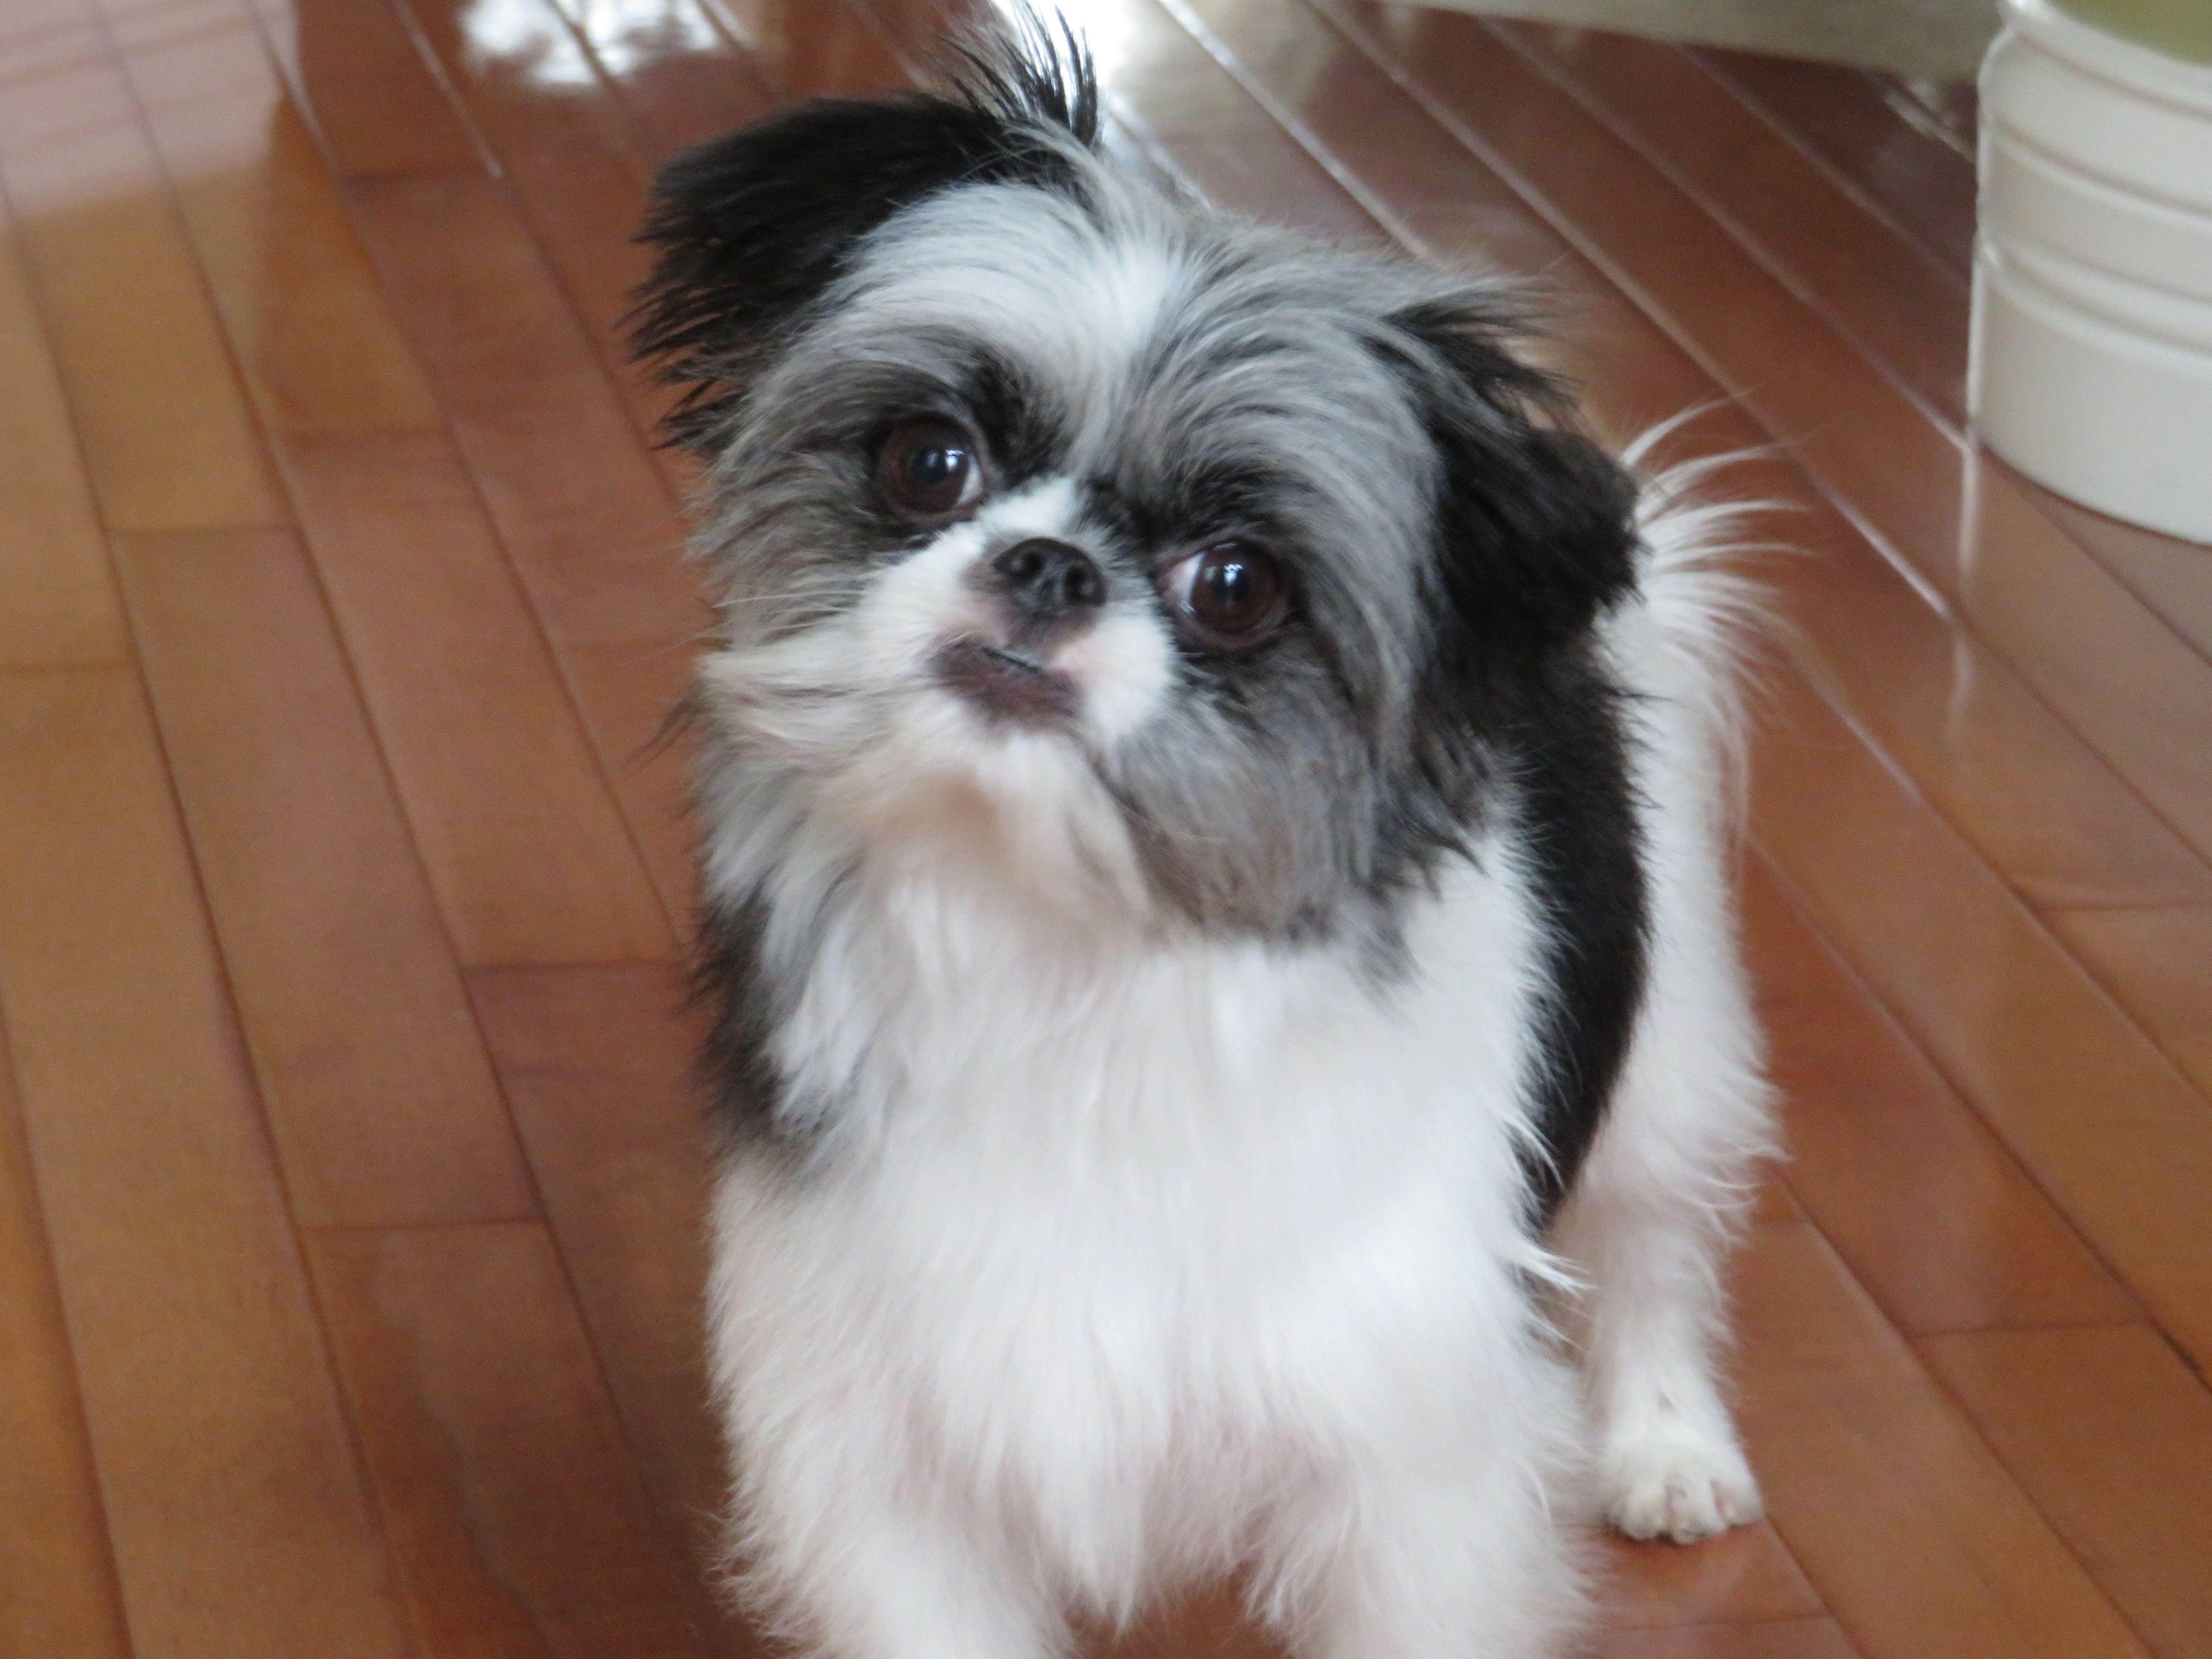 Adopt Ike On Petfinder Animal Shelter Dog Adoption Help Homeless Pets